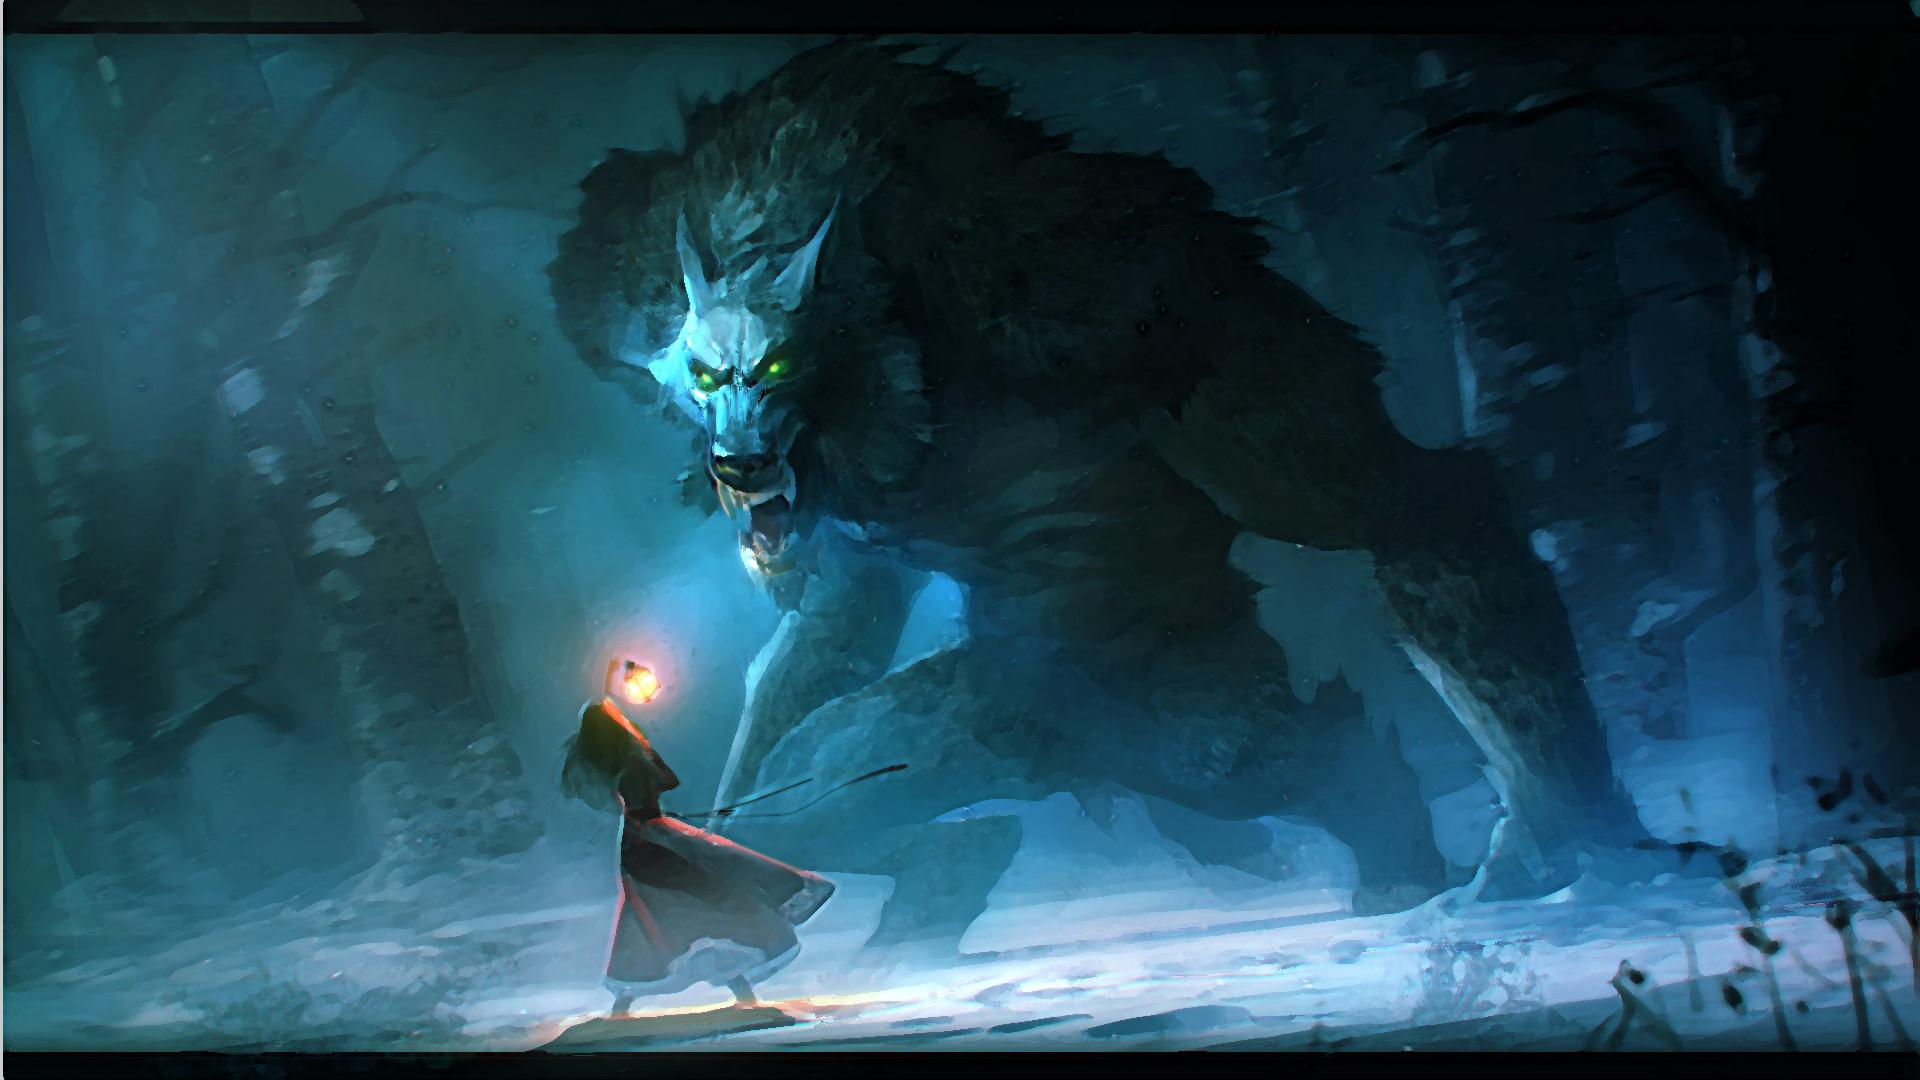 Werewolf Full HD wallpaper by Niconoff deviantart Full HD Wallpapers 1920x1080